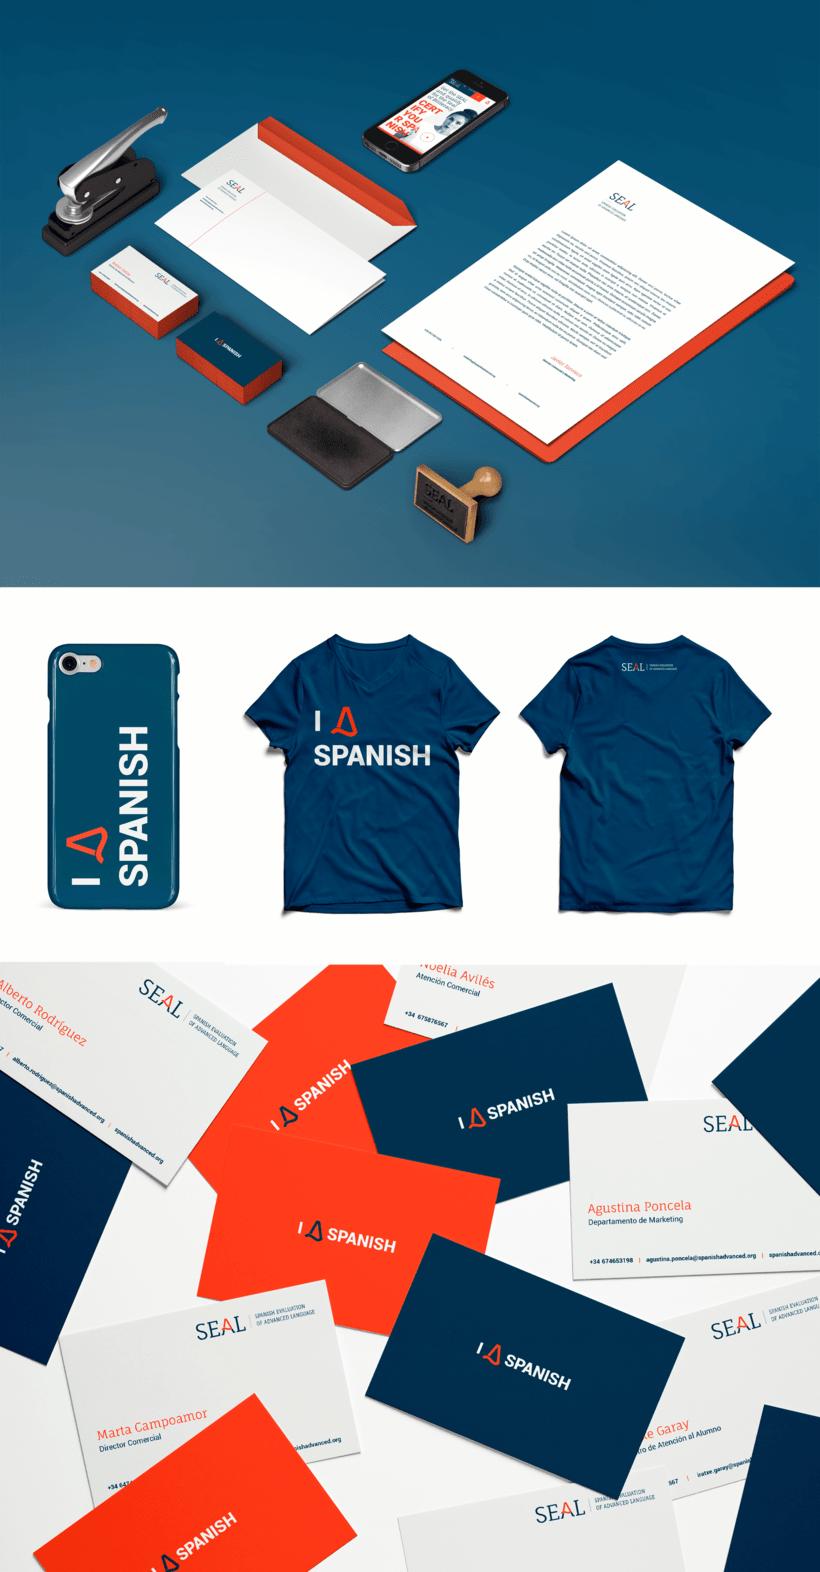 SEAL, Spanish Evaluation of Advanced Language 2